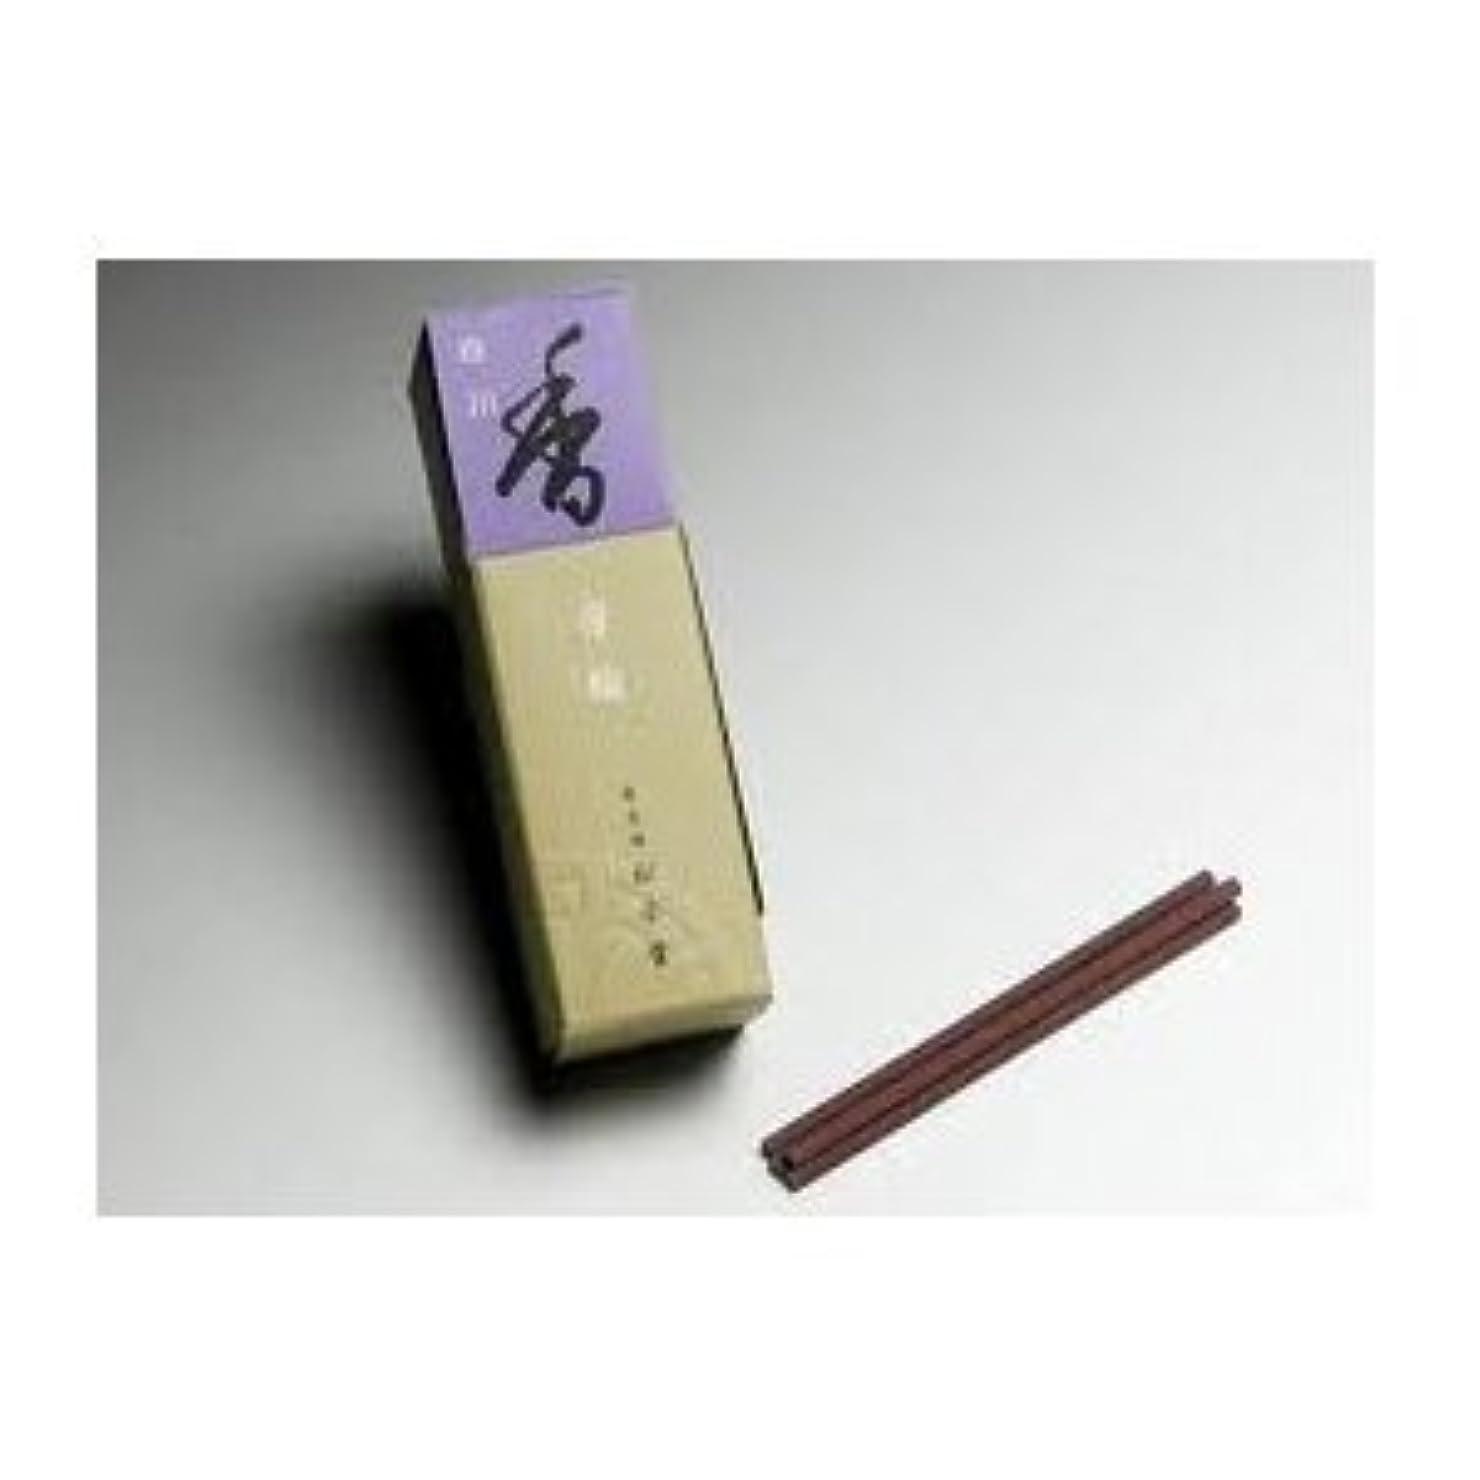 強度国民投票防衛松栄堂 芳輪 白川 スティック型 20本入